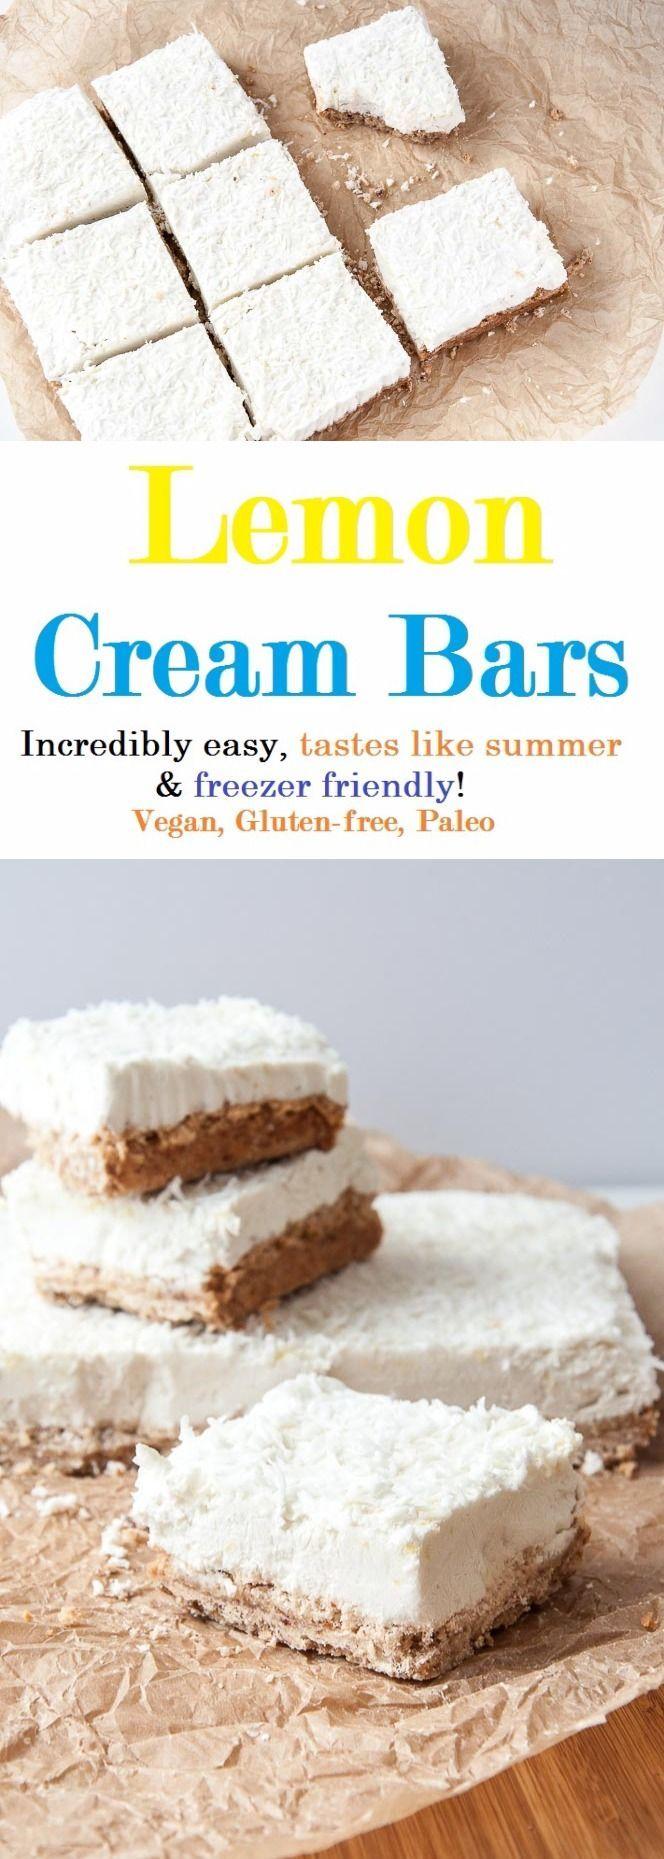 Lemon Cream Bars Recipe (v, gf) -- coconut flour, coconut oil, almonds, date, coconut cream, lemon zest, lemon juice, maple syrup or agave (opt), shredded coconut (opt)